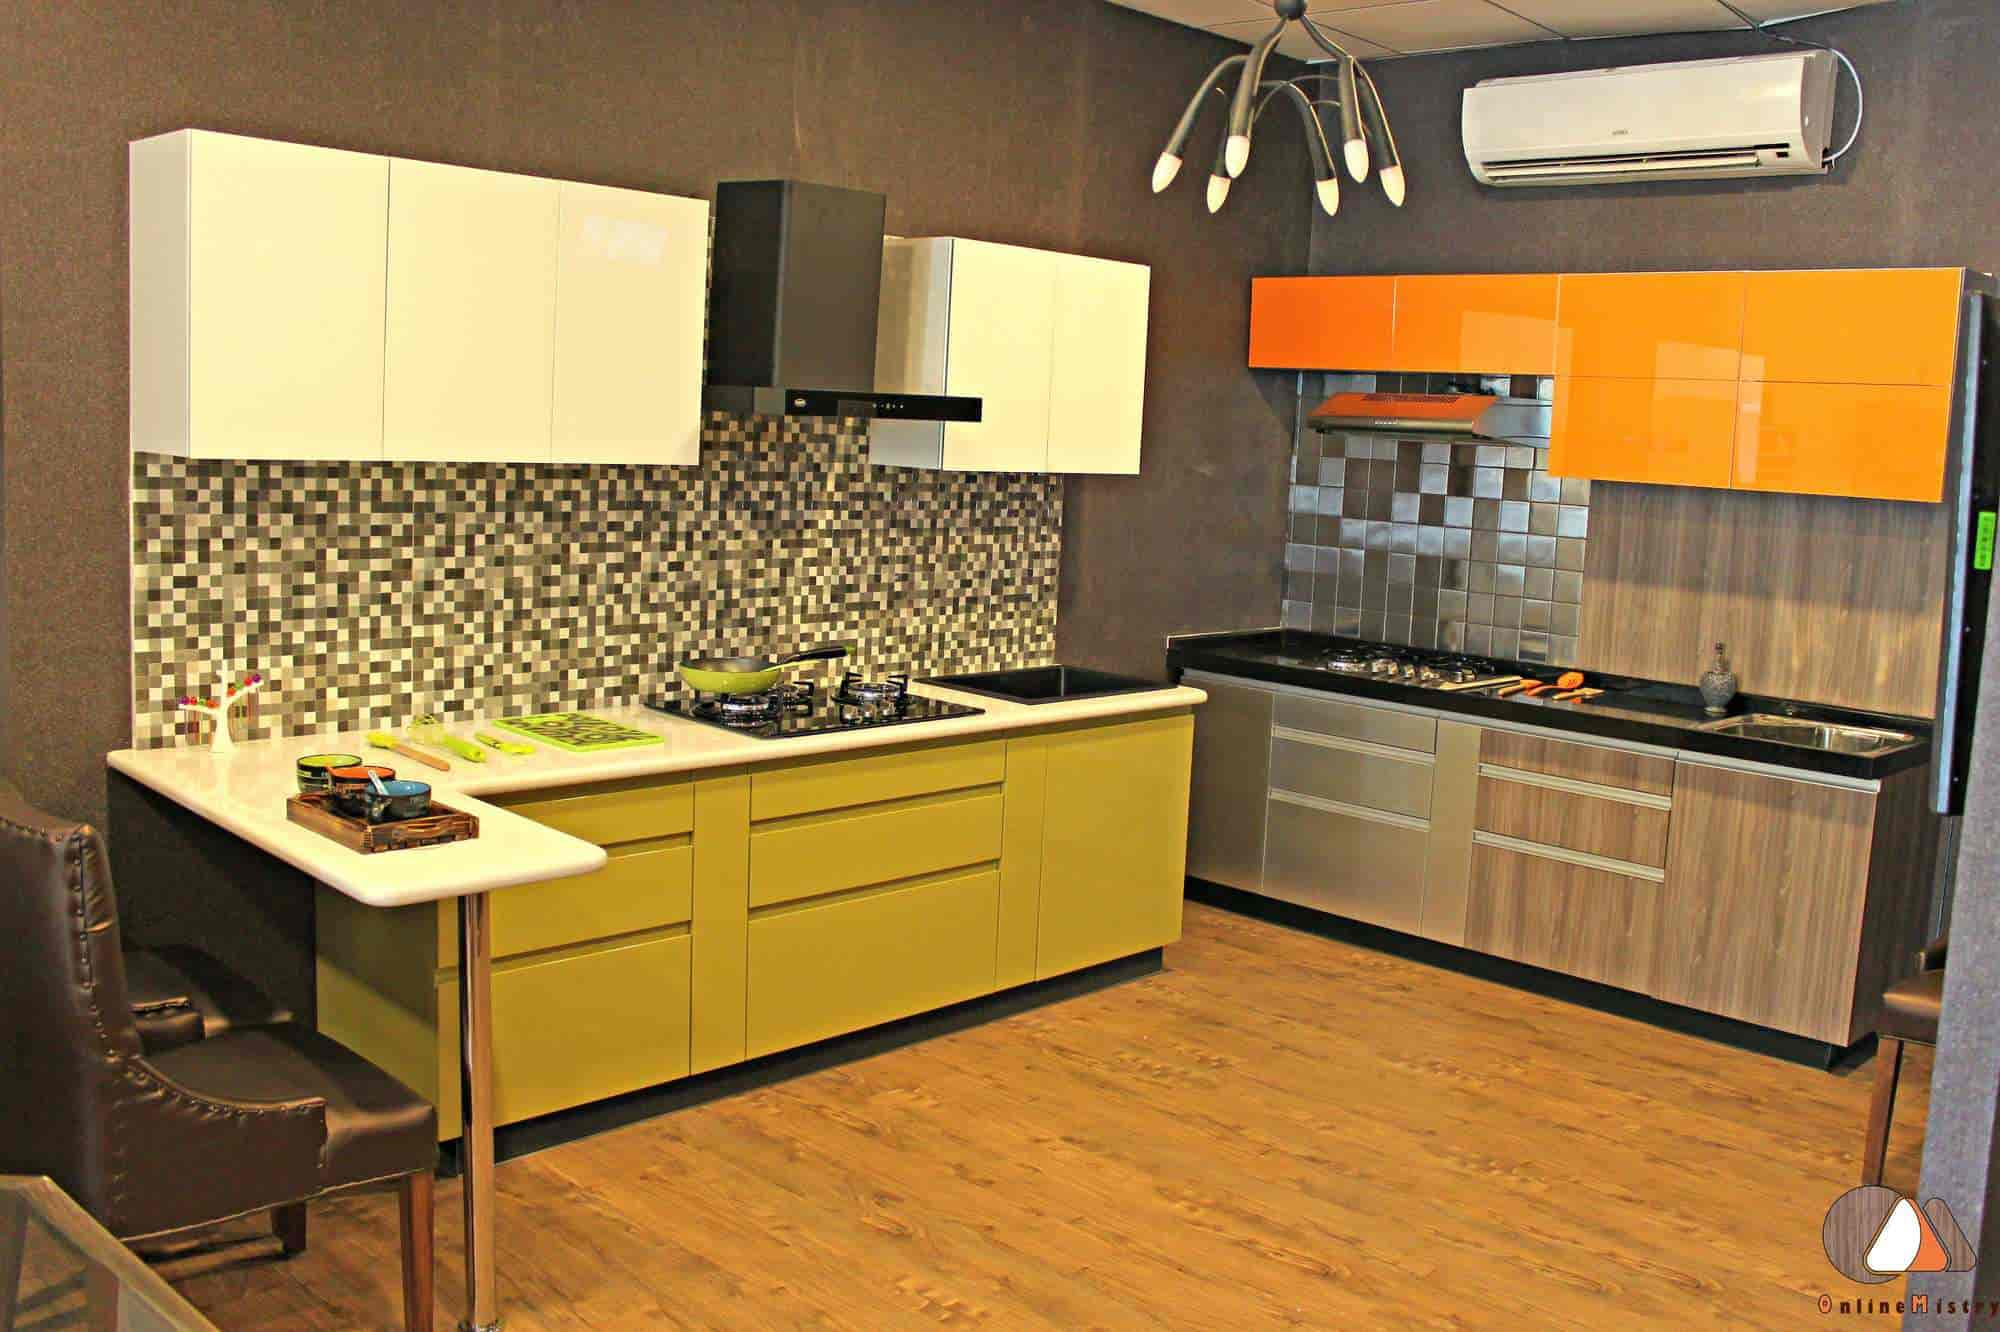 Modular Kitchen Furniture Work Online Mistry By Homesets Furnitures Pvt Ltd Photos Khar West